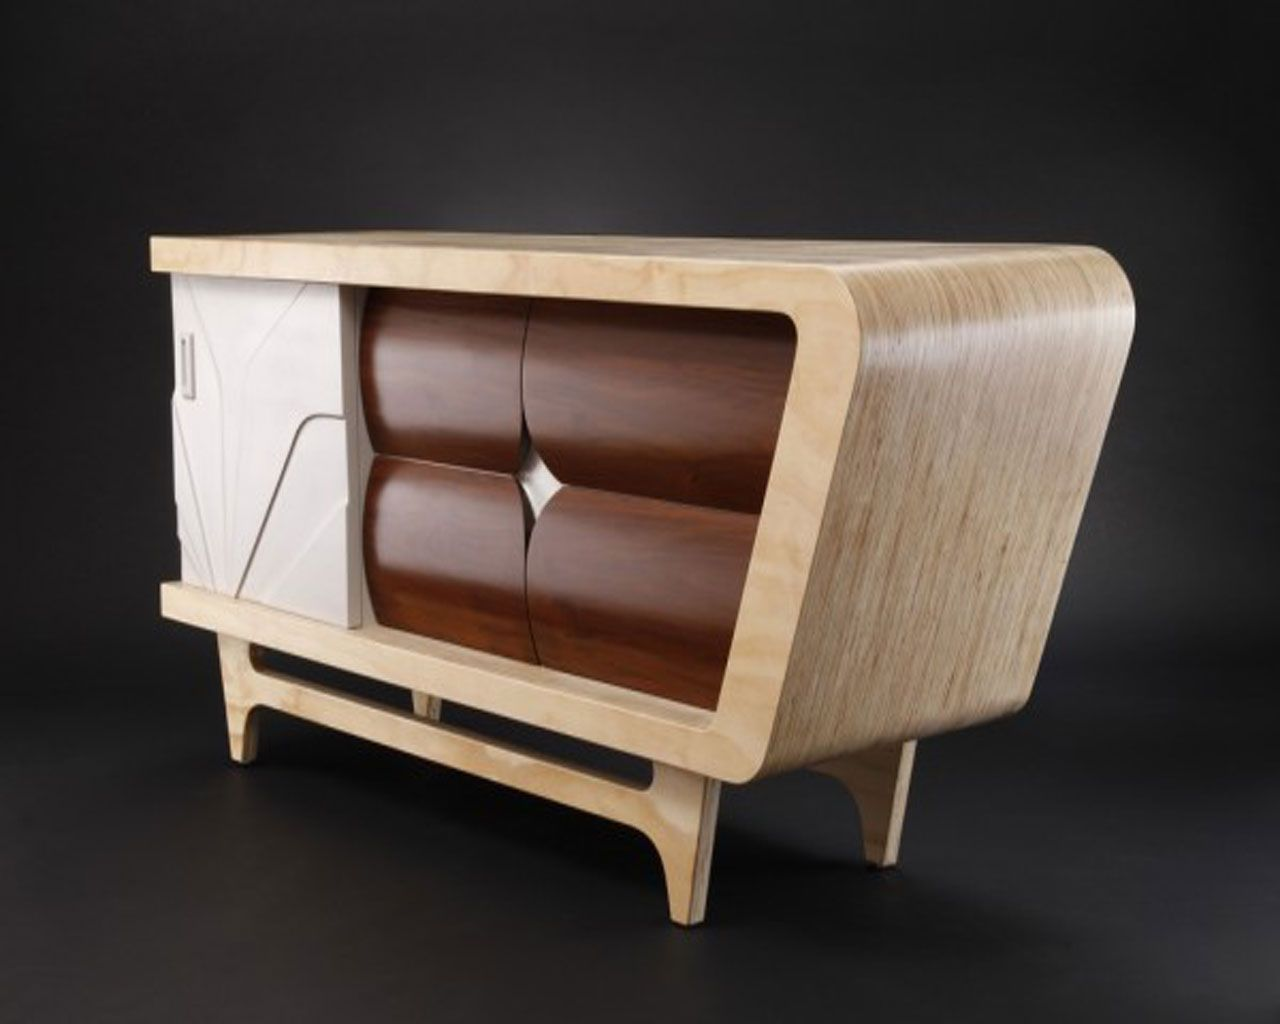 Beau Jory Brigham | Modern Jory Brigham Furniture